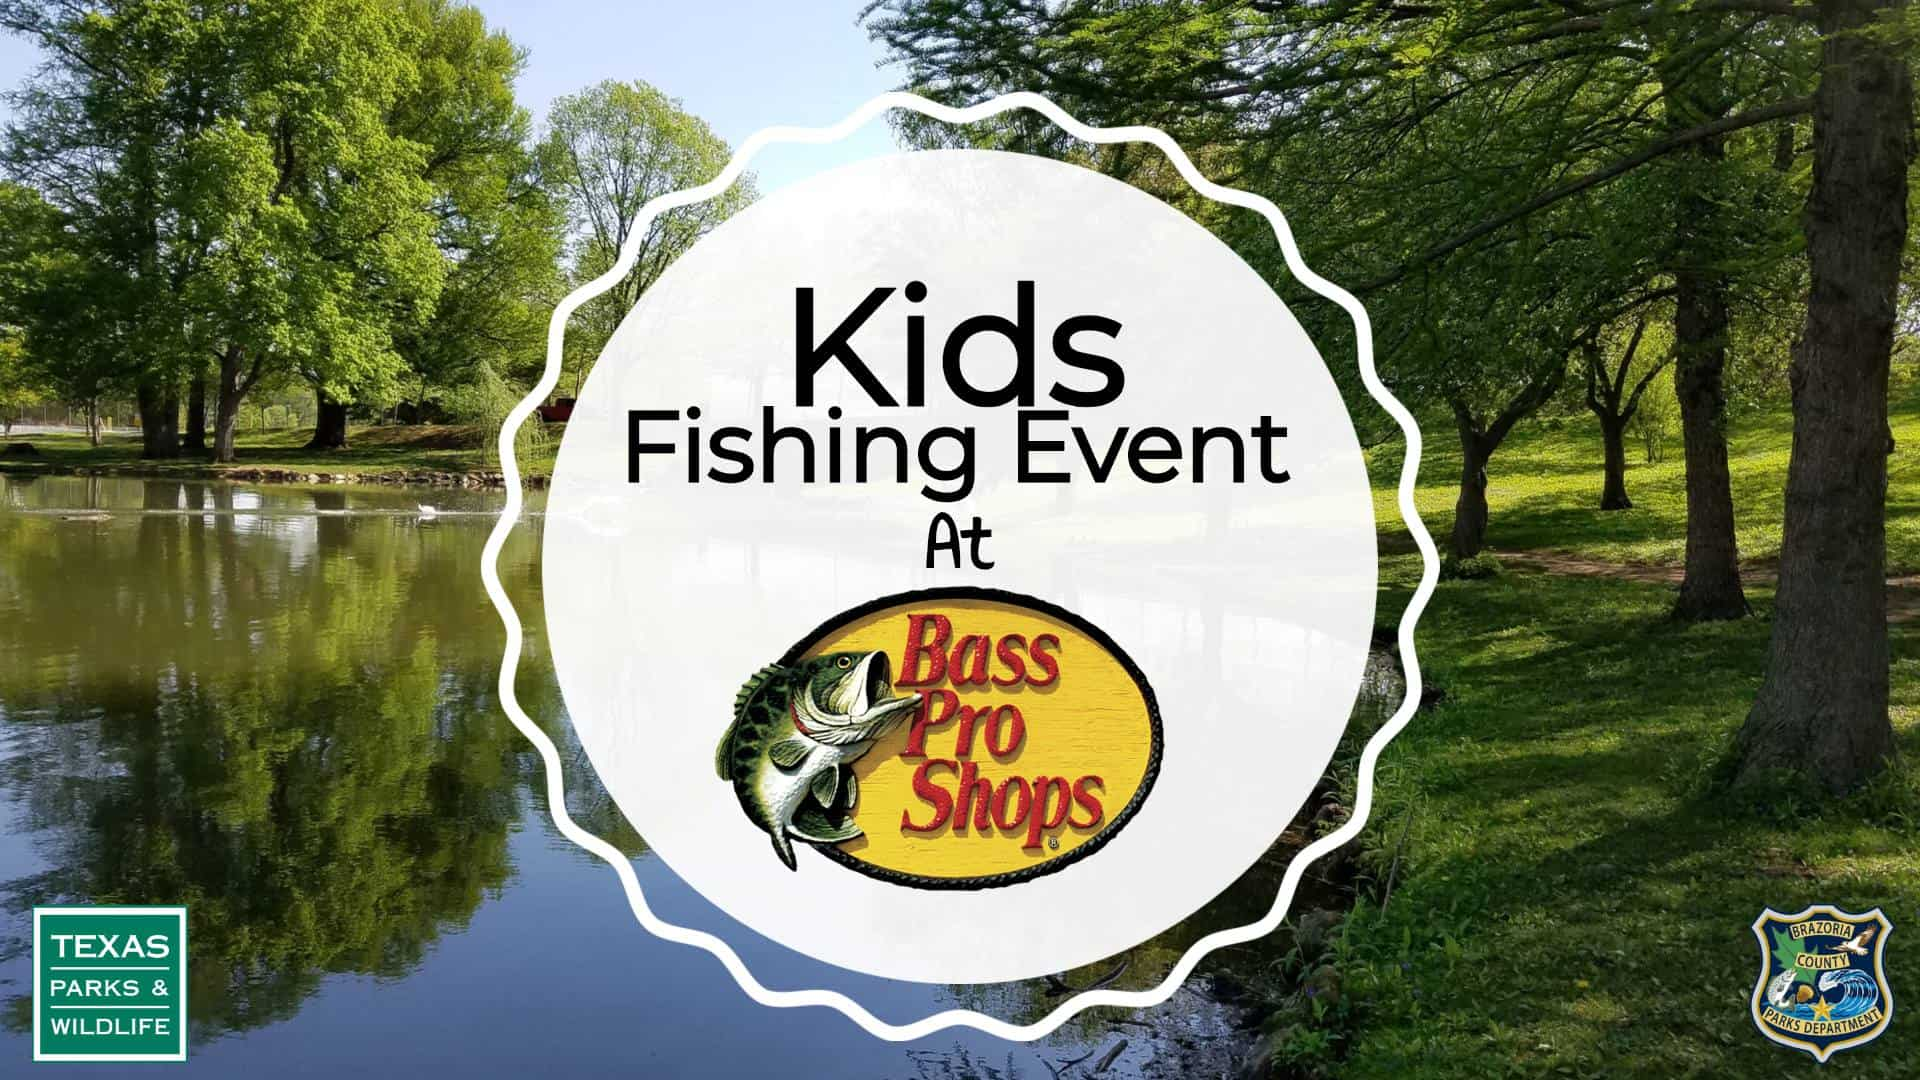 Bass pro shop fishing - Pearland Texas Convention & Visitors Bureau